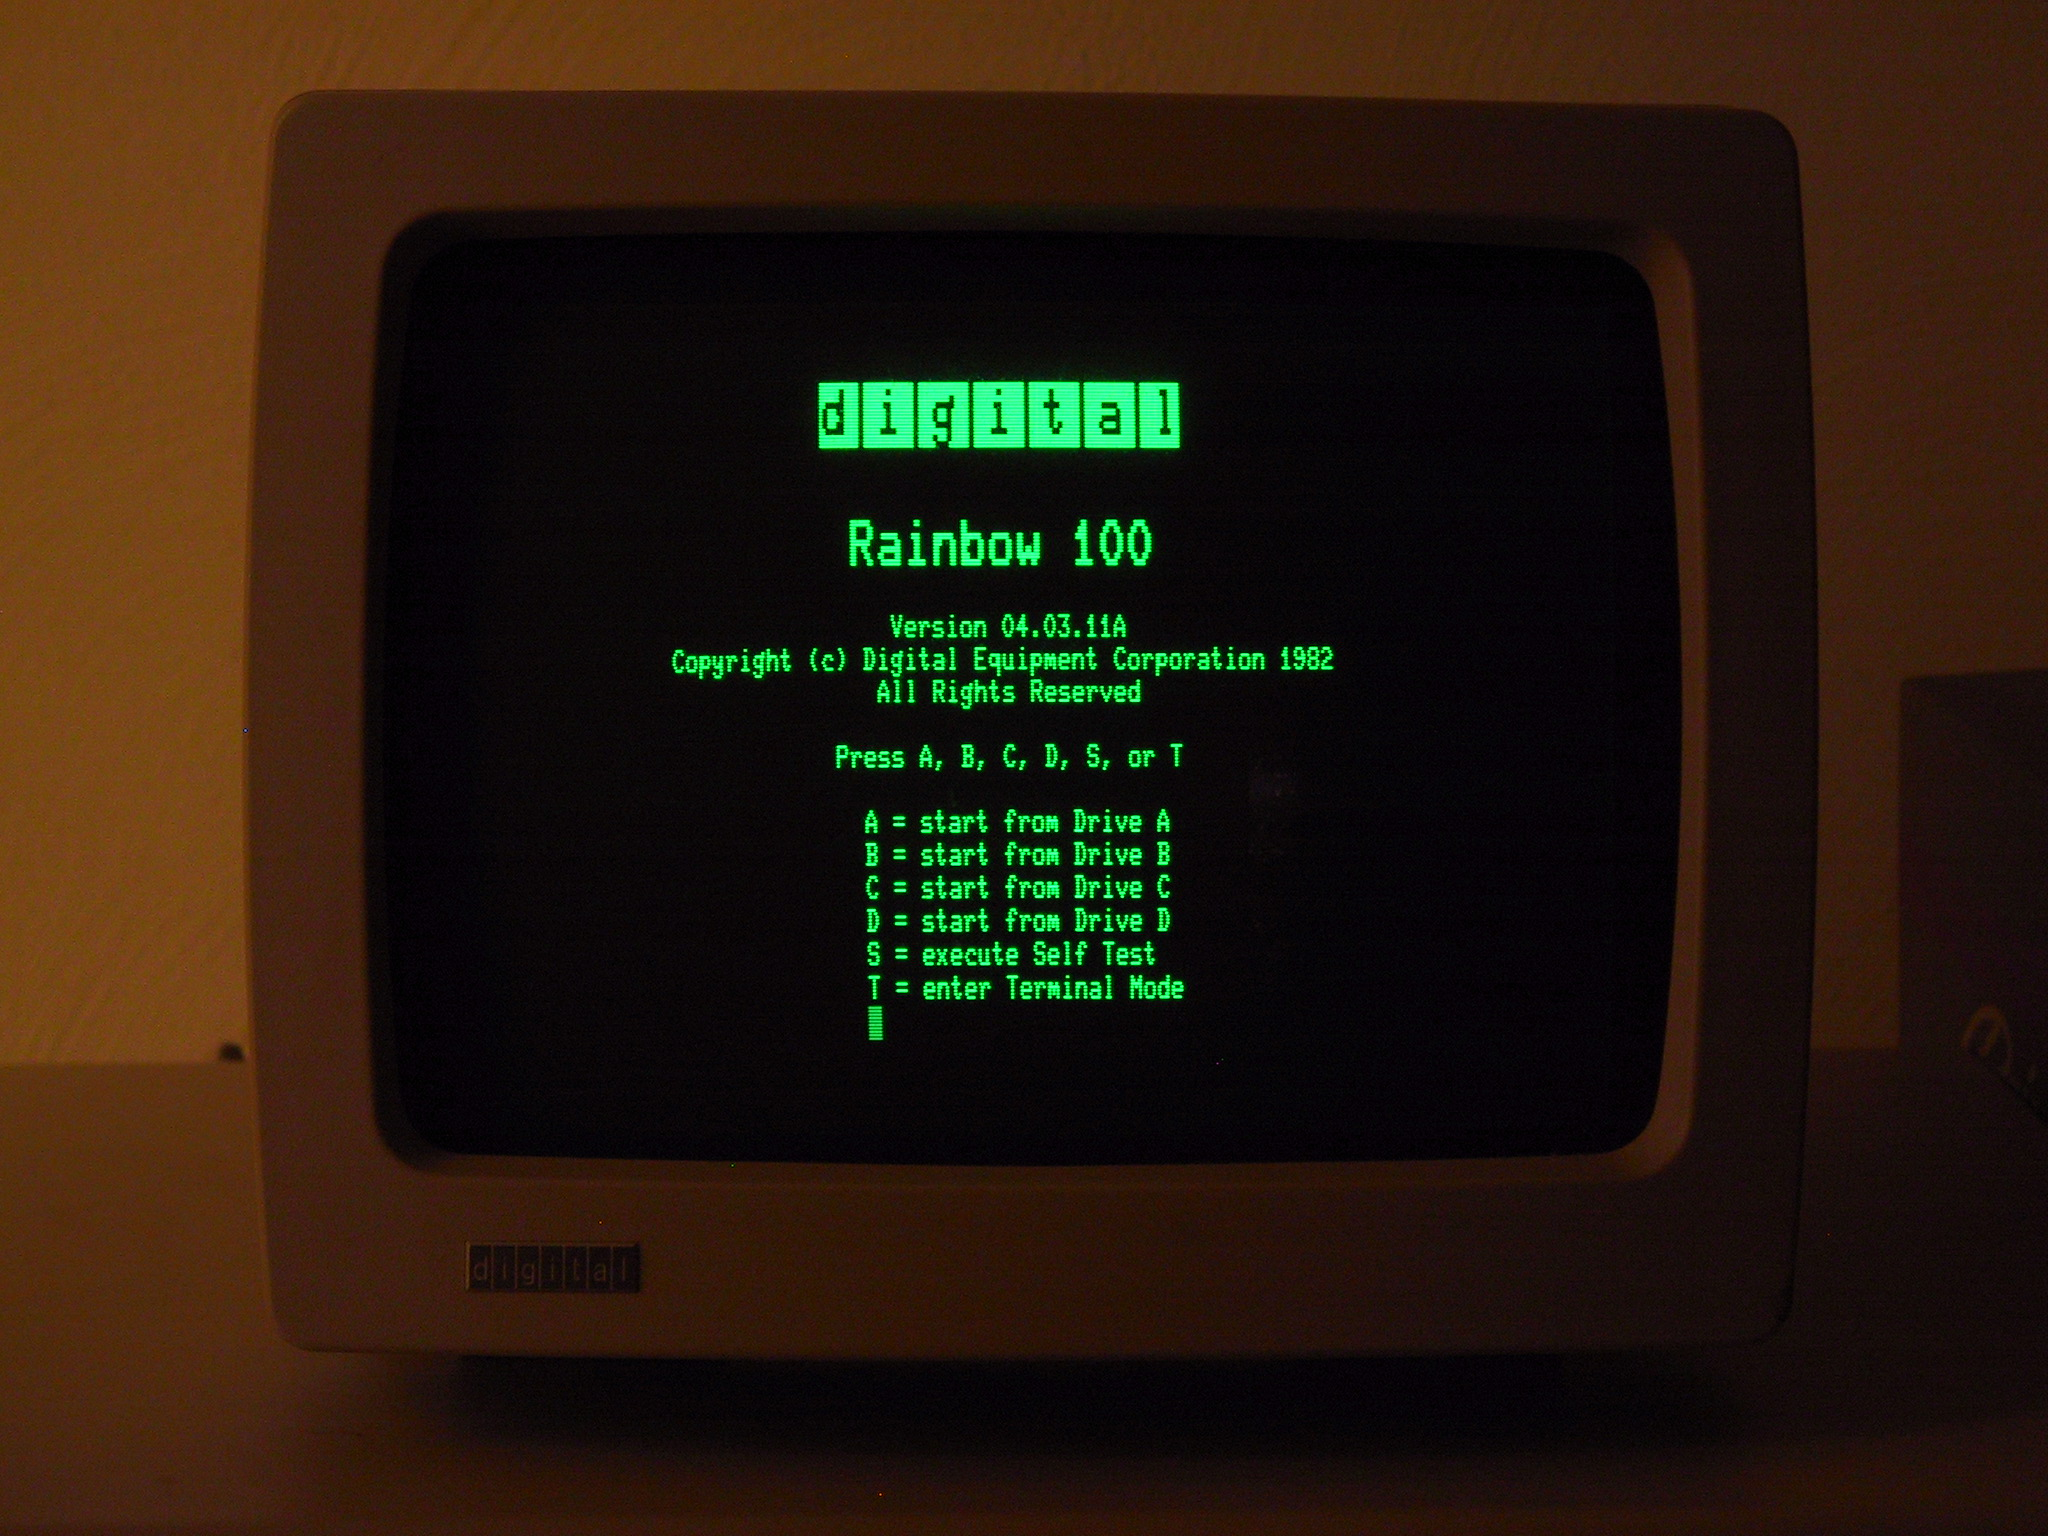 DEC Rainbow 100 Startup